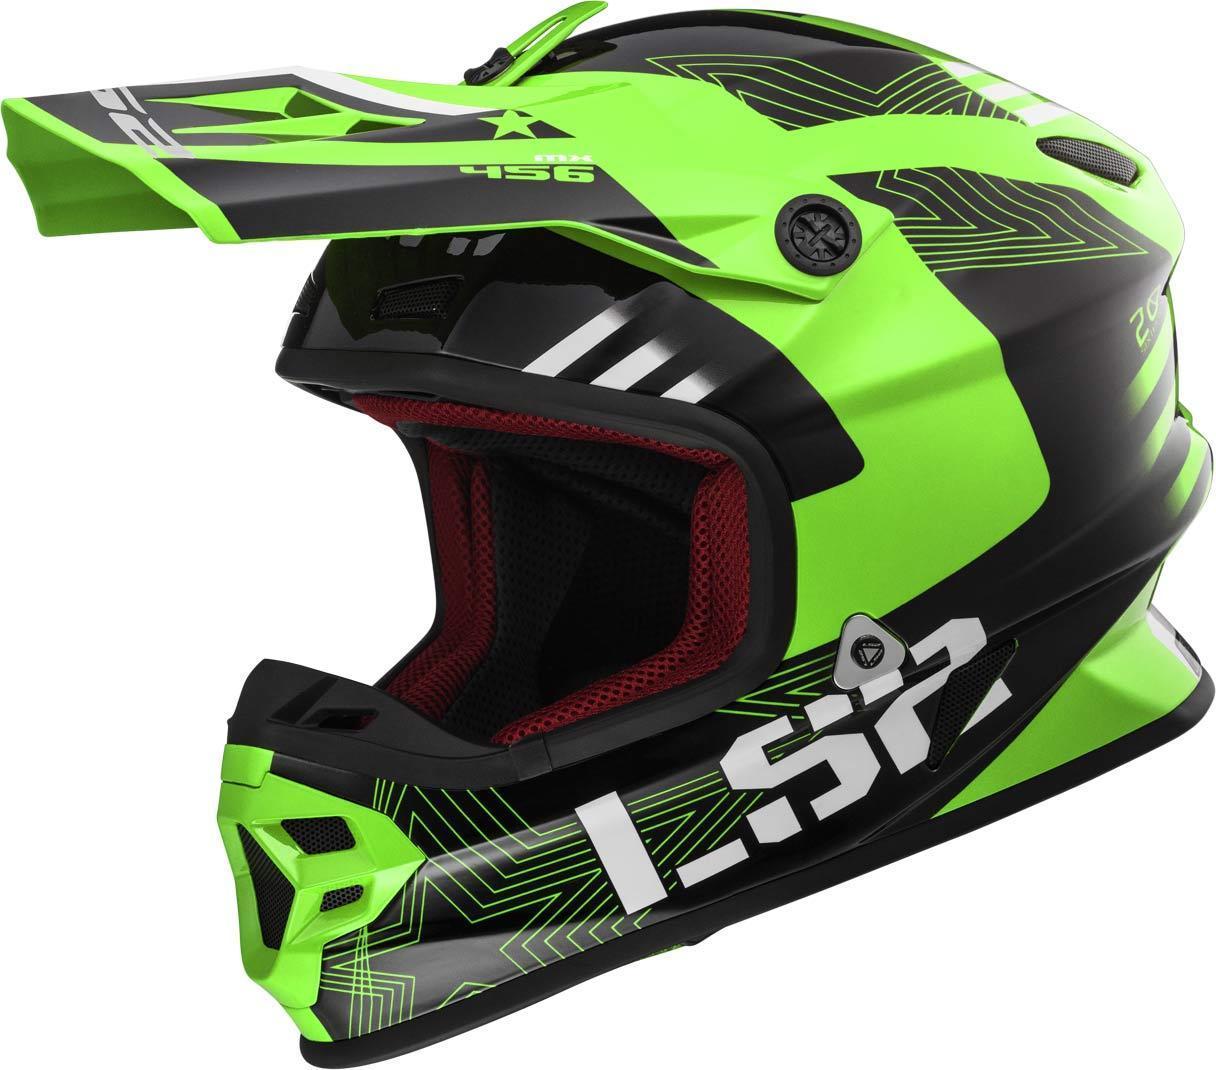 LS2 MX456 Light Evo Rallie Motocross Helm, grün, Größe XL, grün, Größe XL